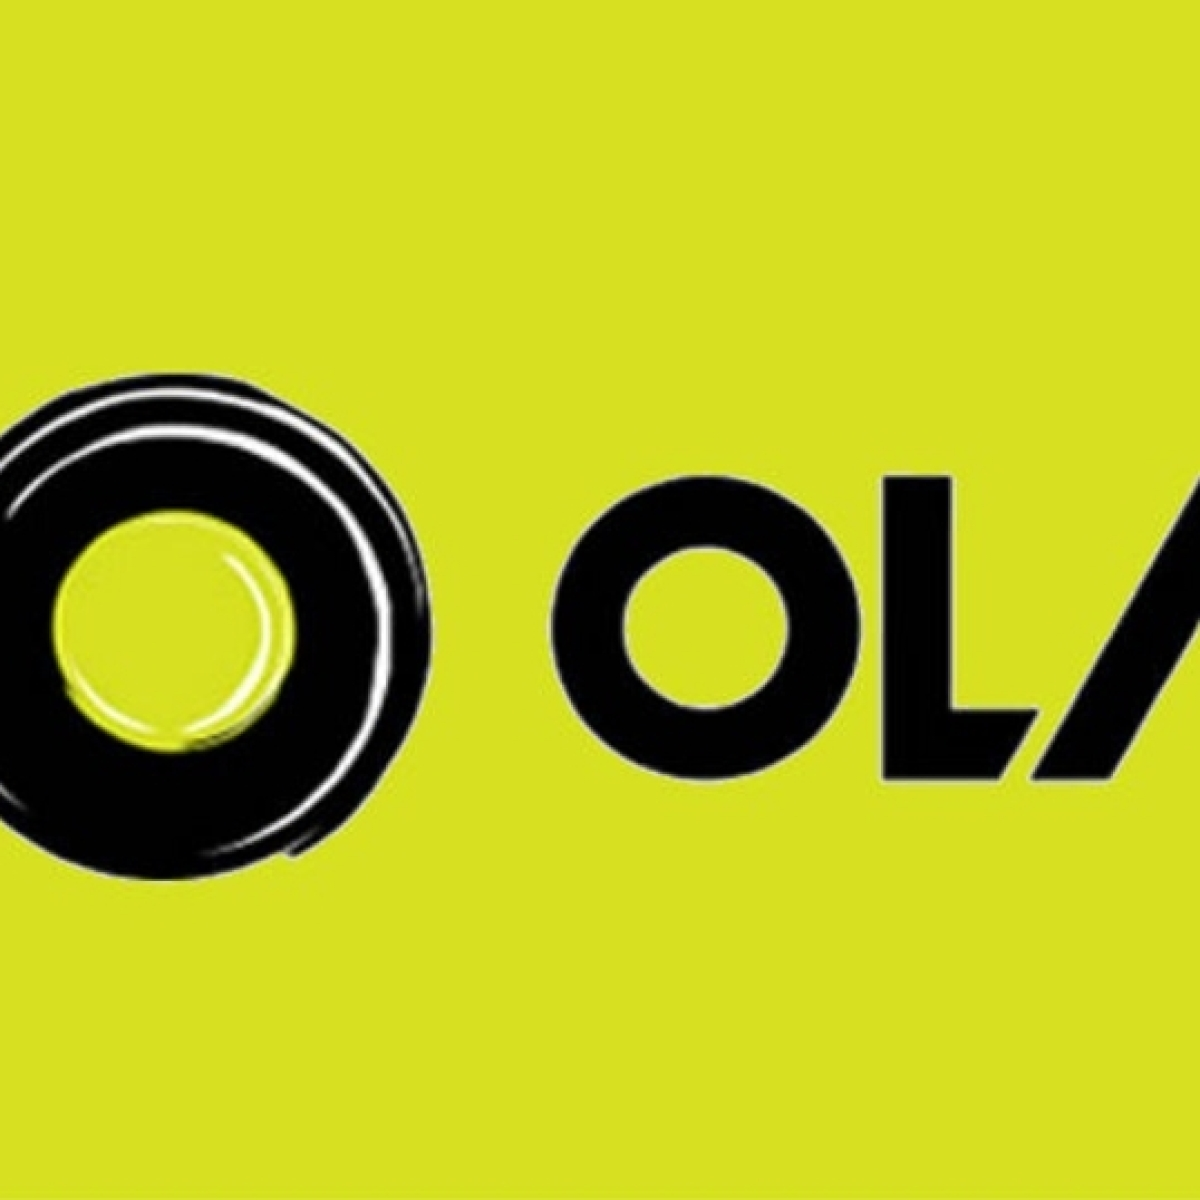 Ola Electric gets $250 million from SoftBank, enters Unicorn club